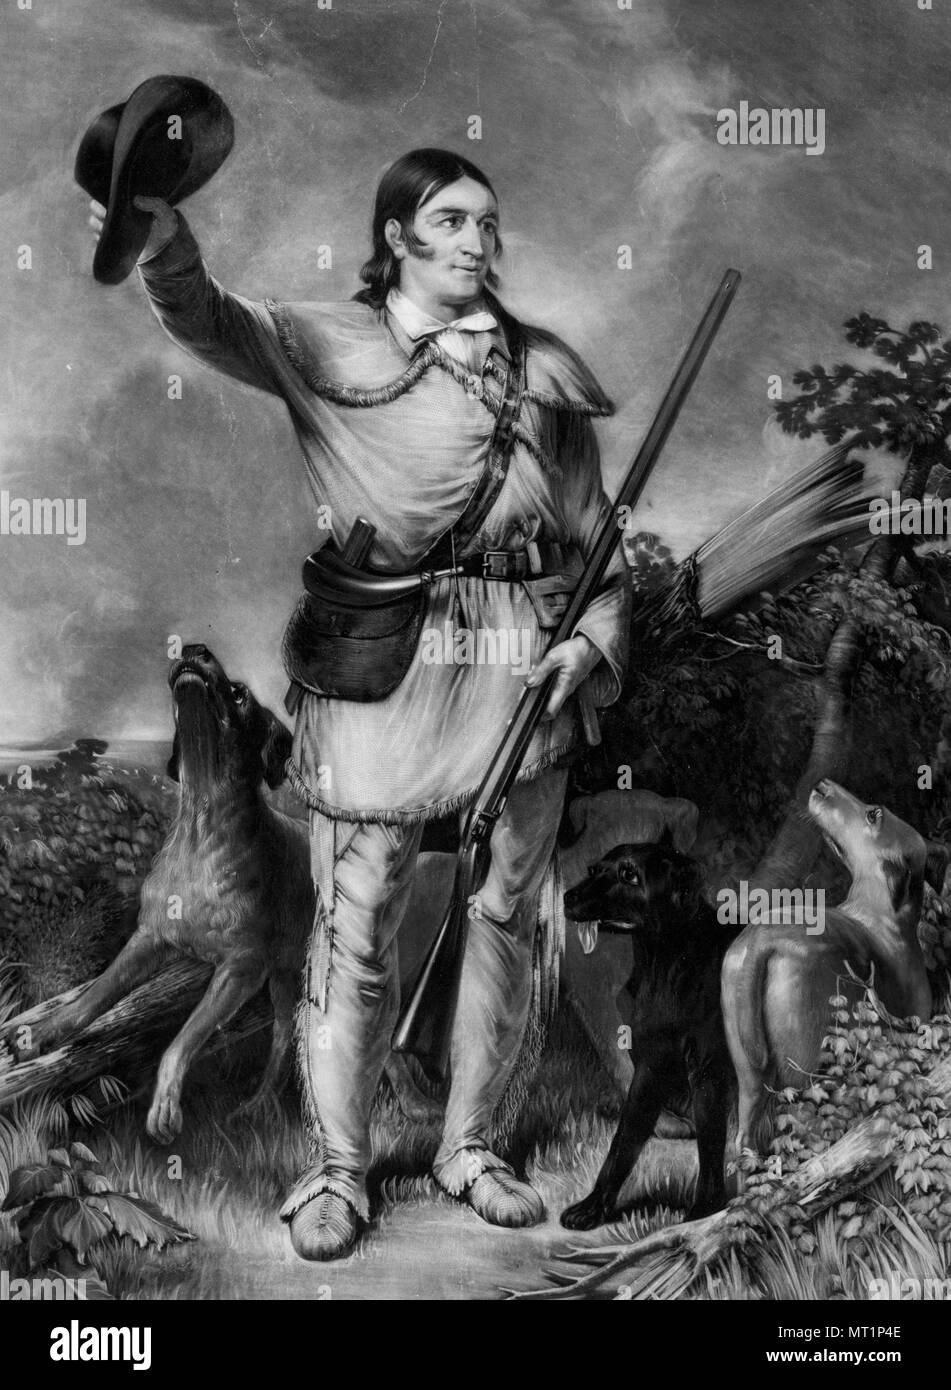 Davy Crockett, David 'Davy' Crockett (1786 – 1836) 19th-century American folk hero, frontiersman and politician - Stock Image